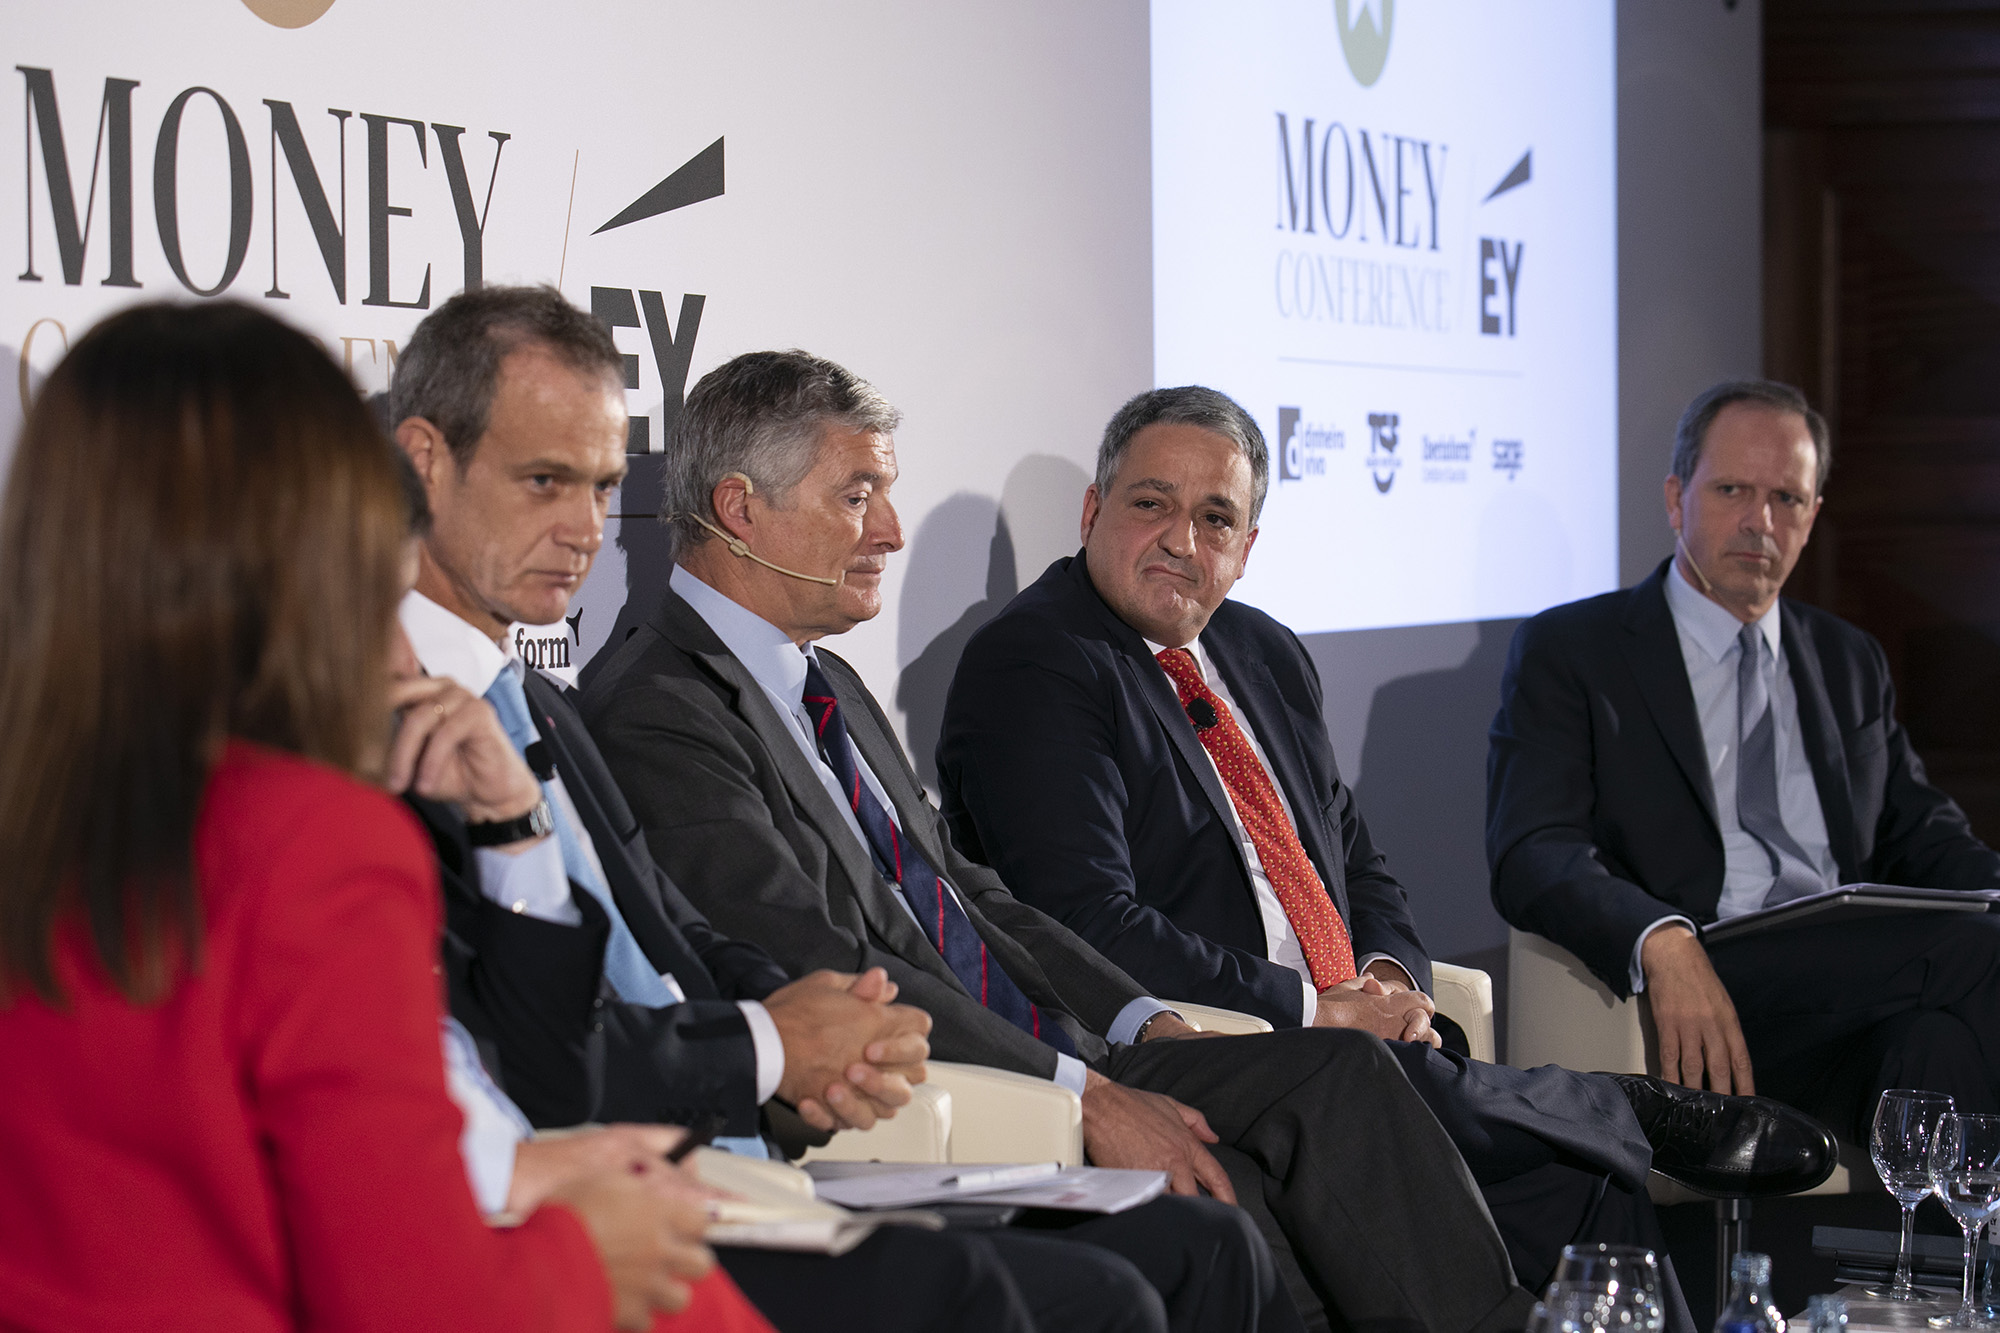 Money Conference/EY - 22NOV19